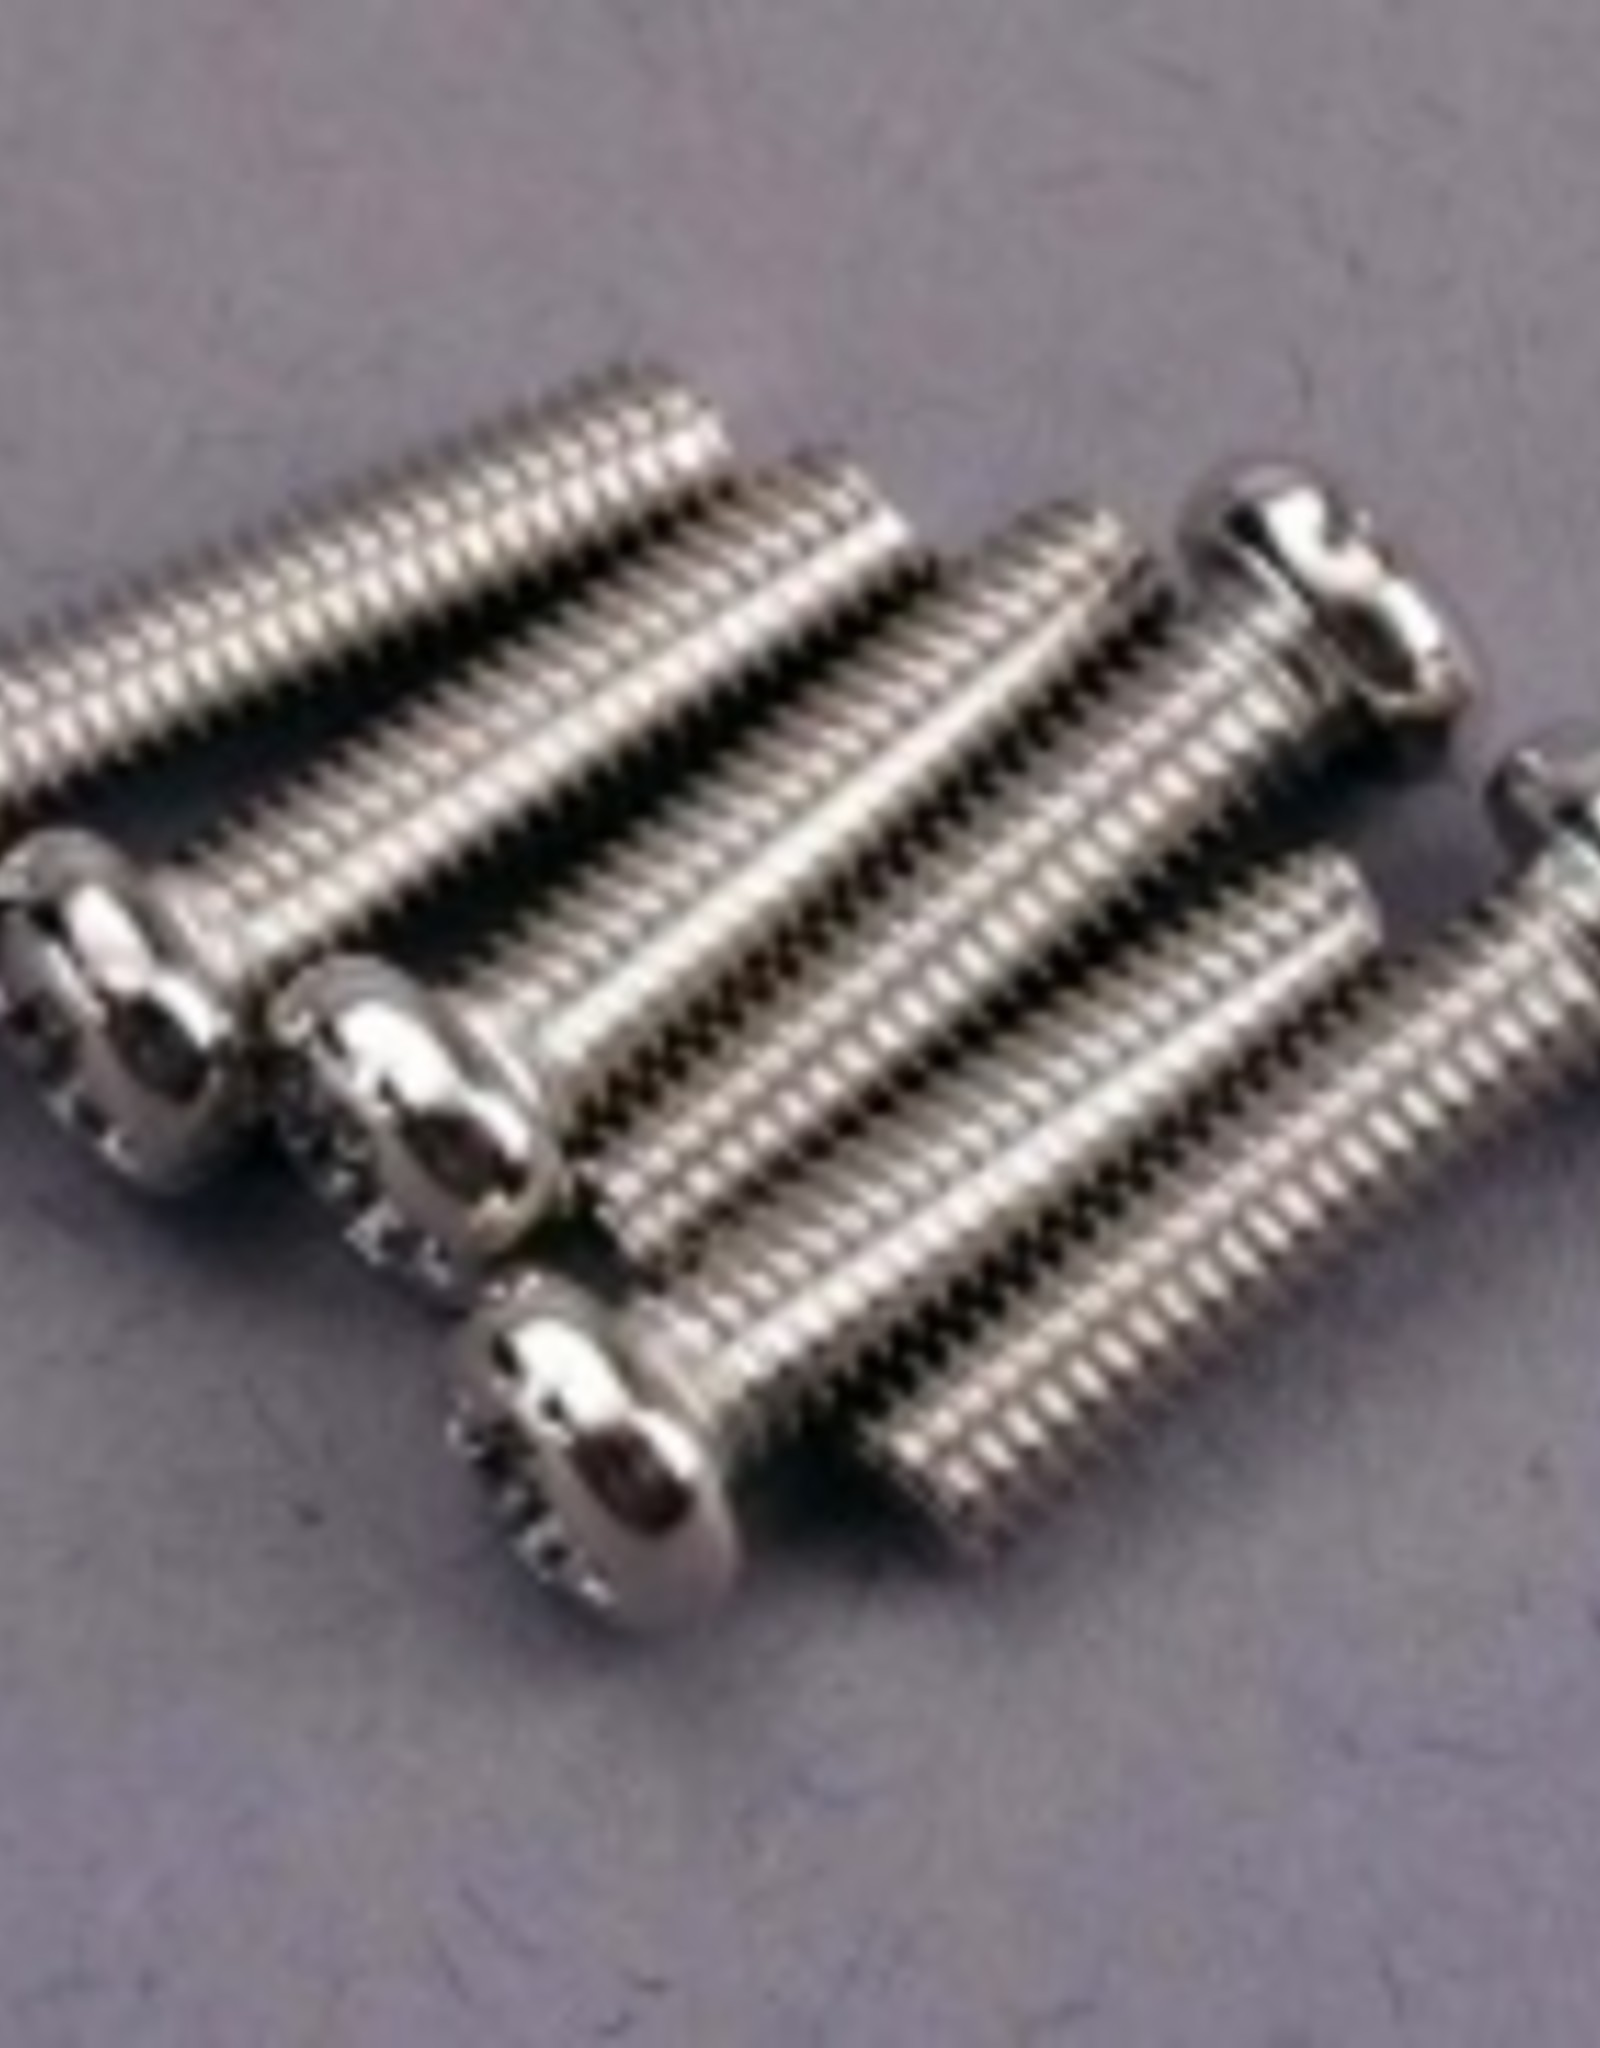 Traxxas Traxxas Screws, 3x12mm roundhead machine (6)